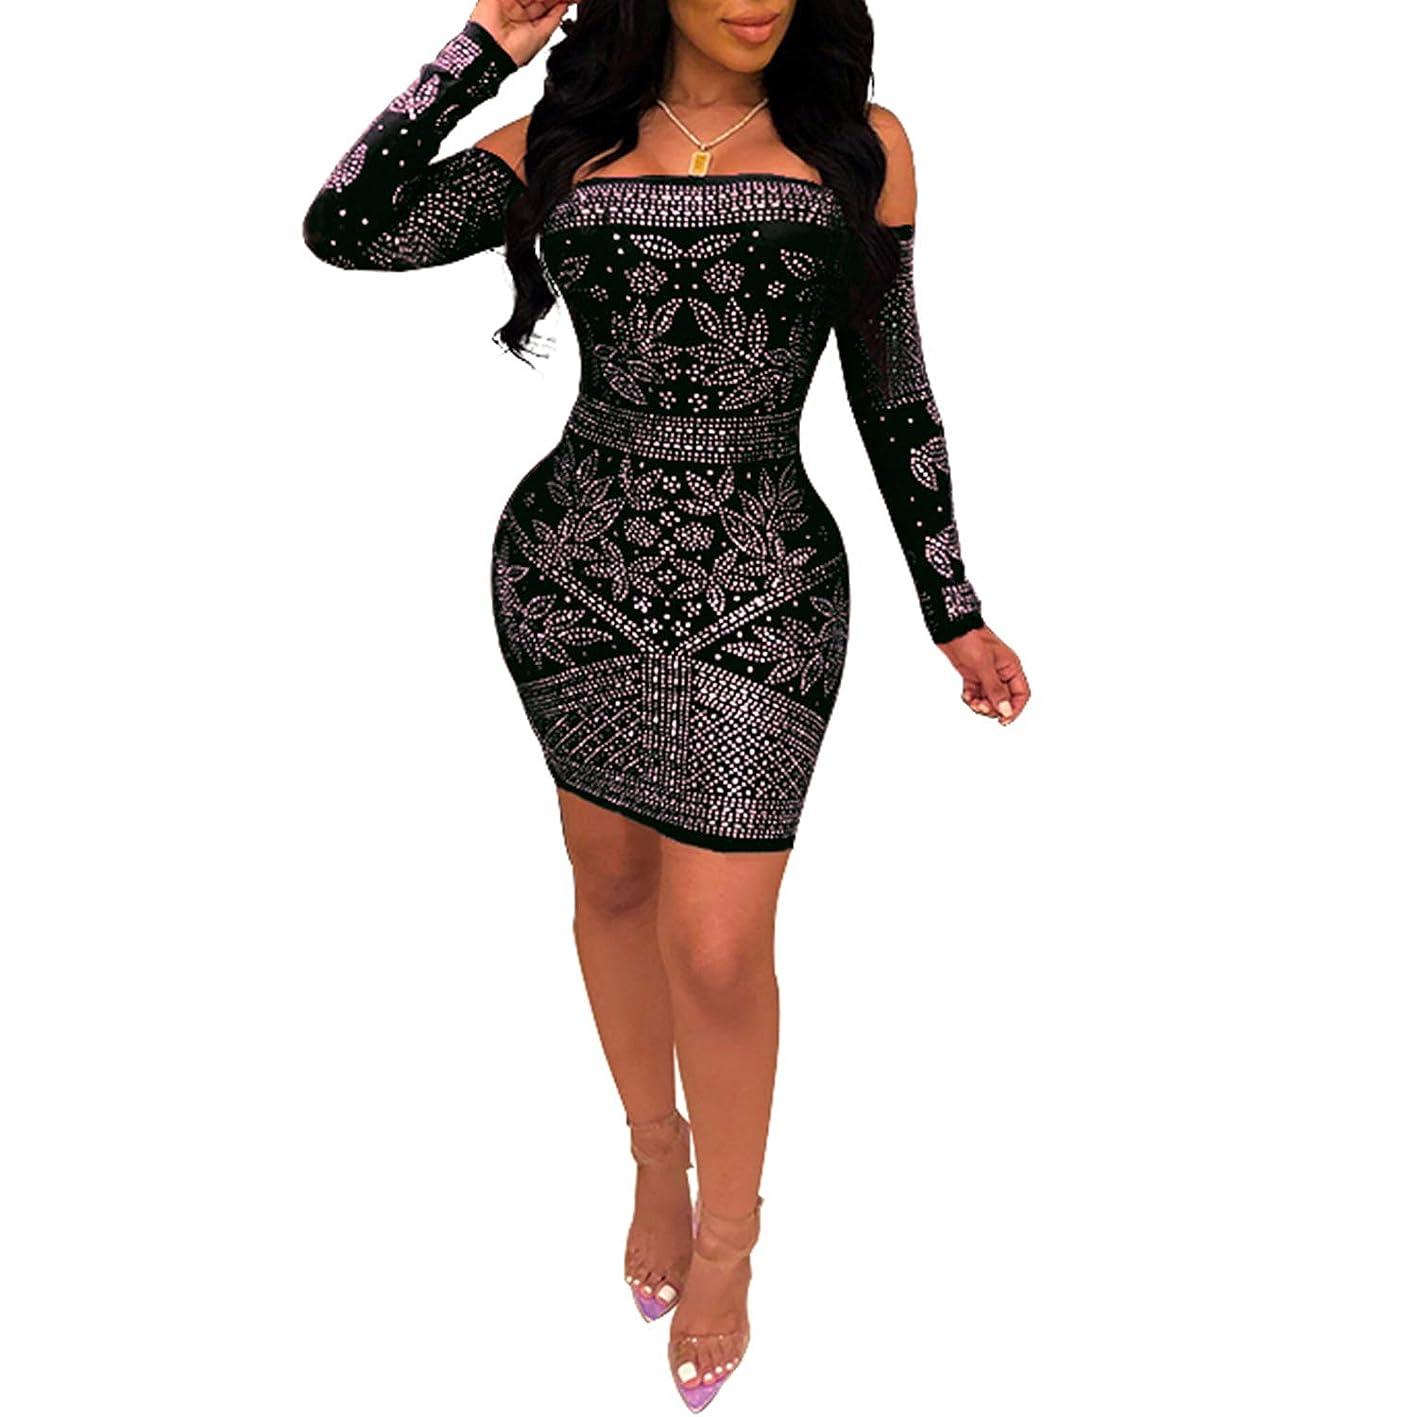 Women's Sexy Bodycon Party Club Night Out Dress (X-Large, Black 9) zasrucibvsn431